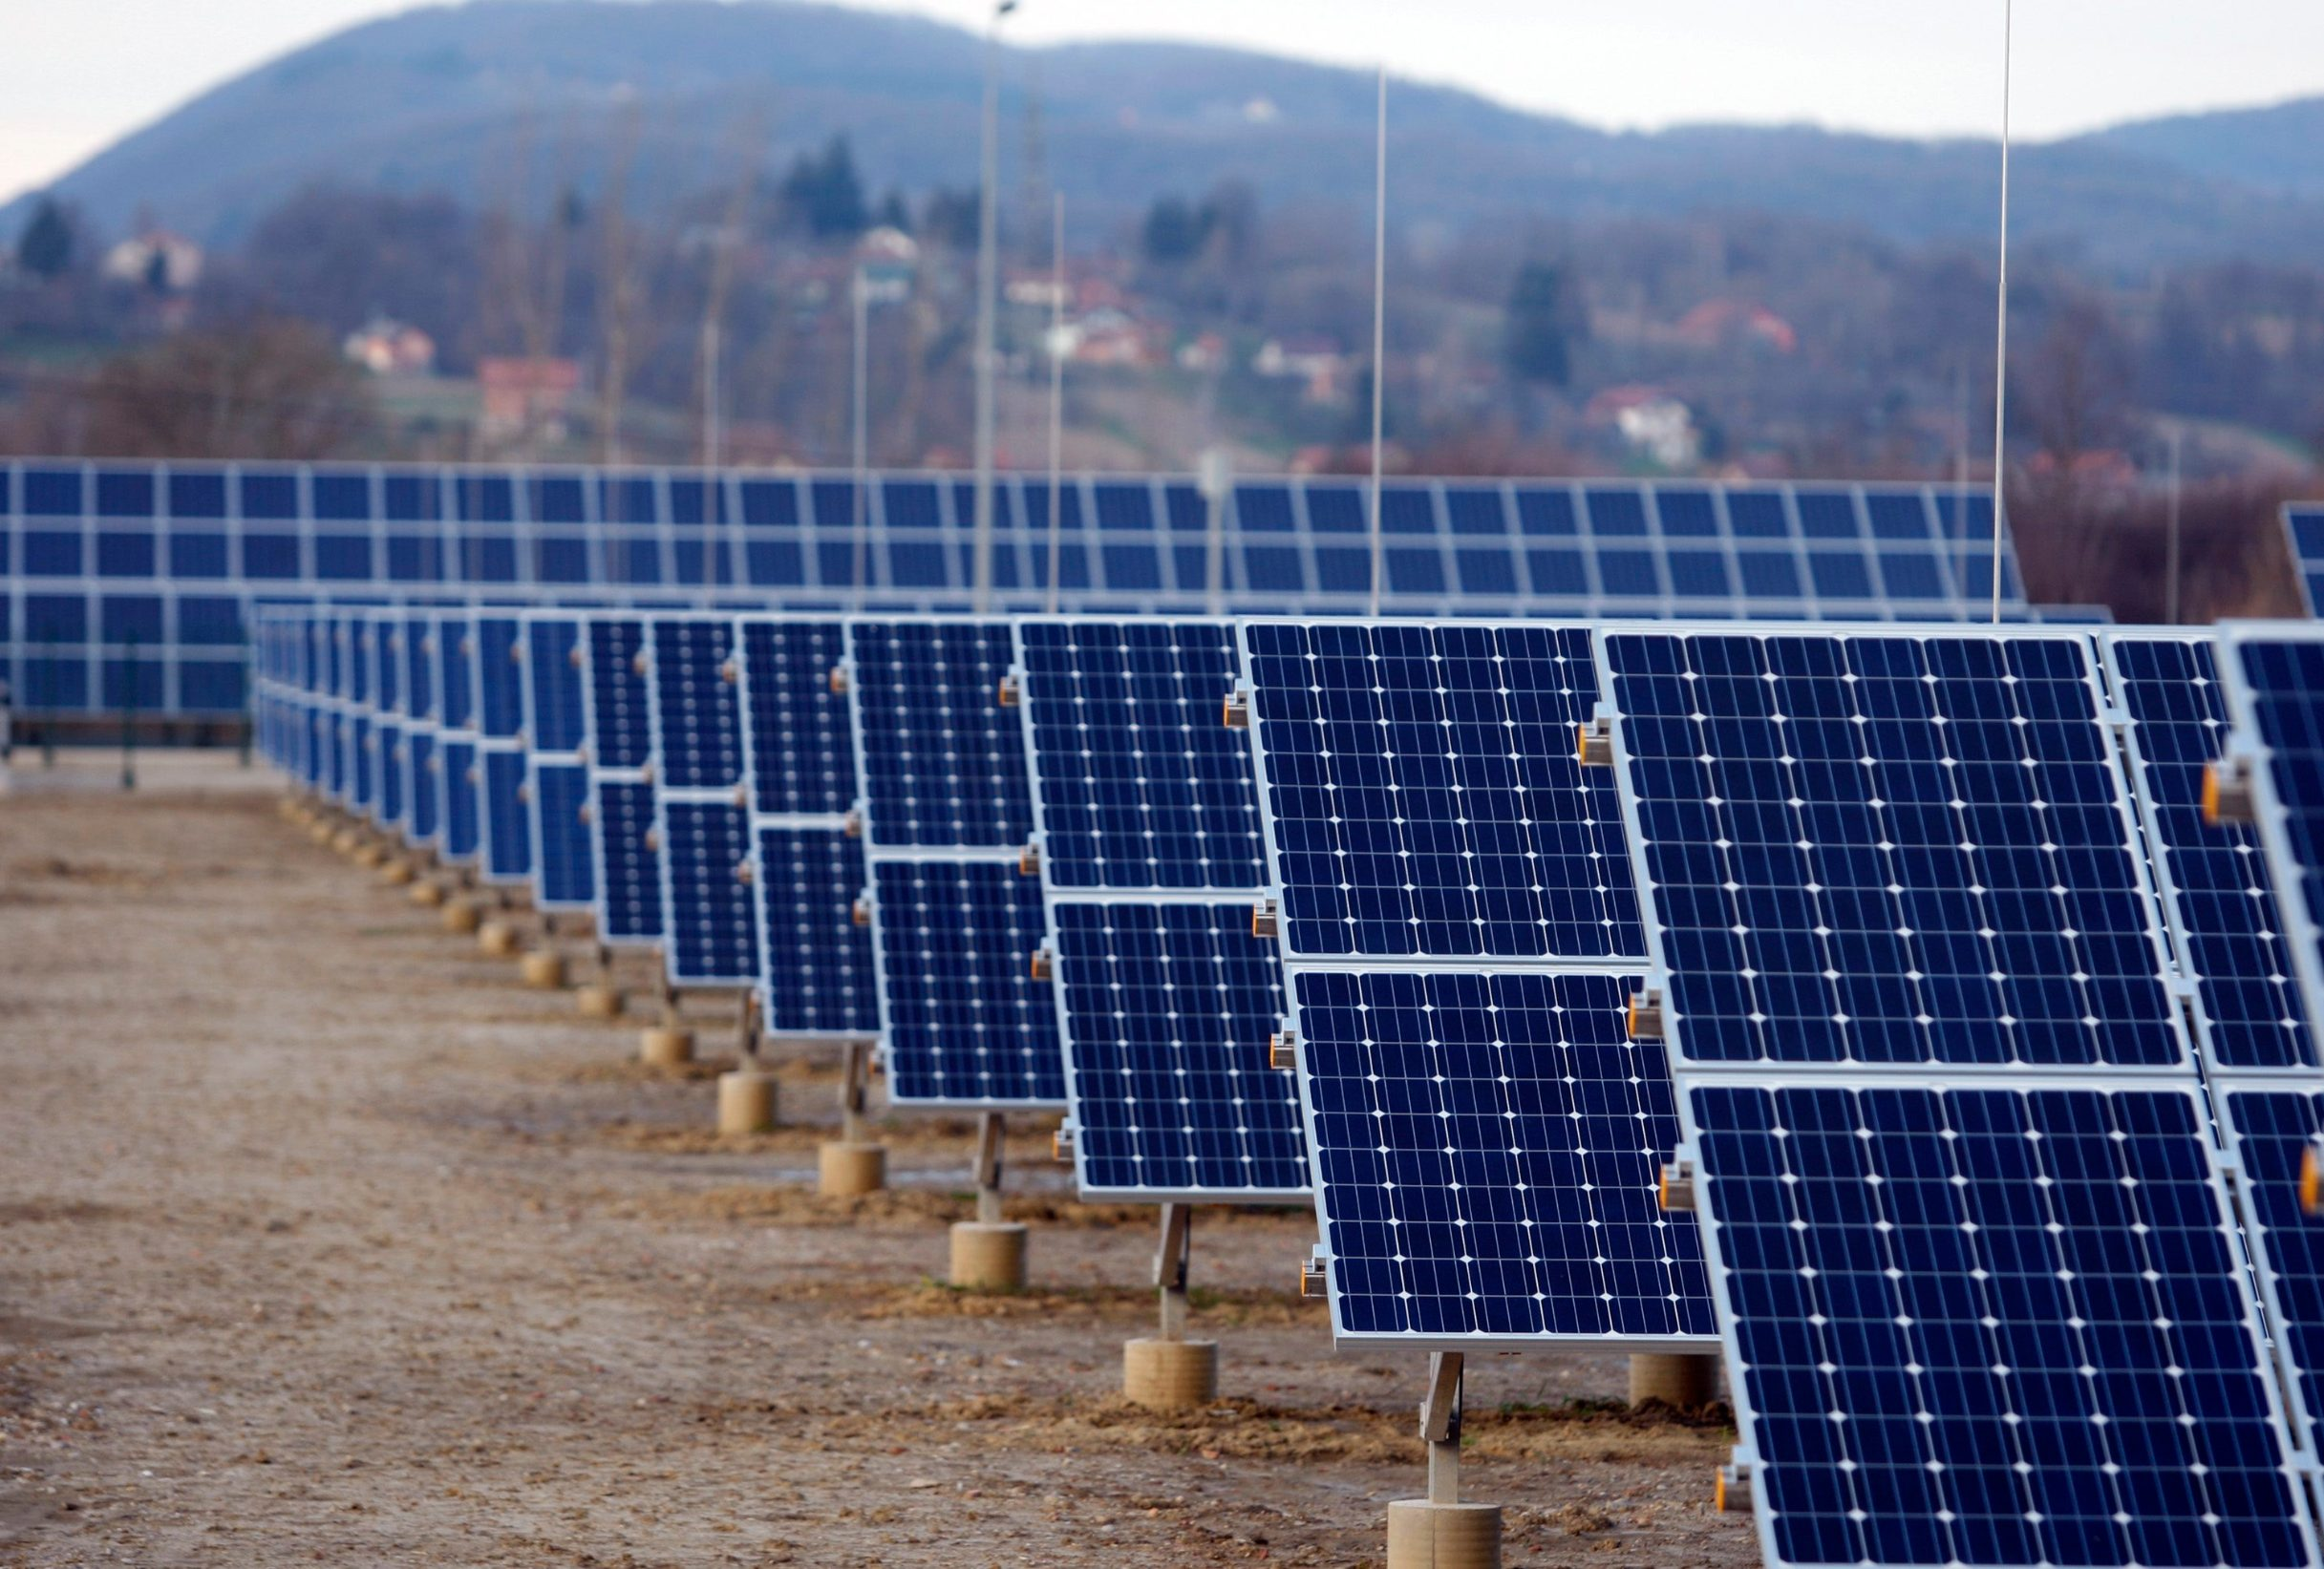 Solarna elektrana, ilustracija